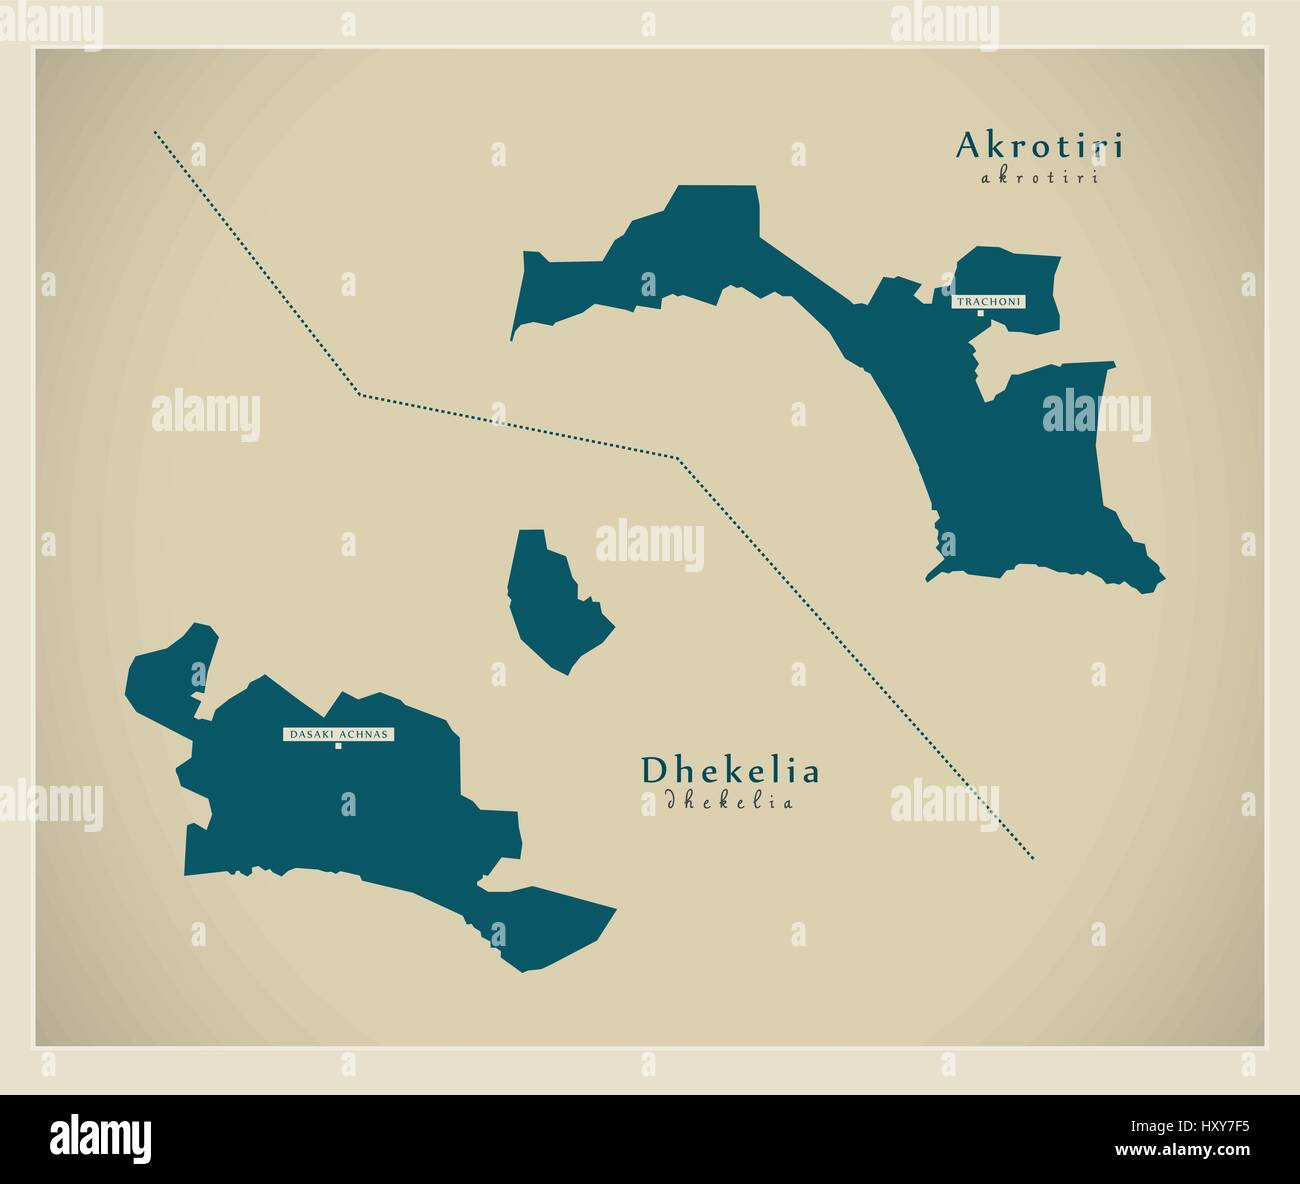 Modern Map Akrotiri and Dhekelia on Cyprus Stock Vector Art